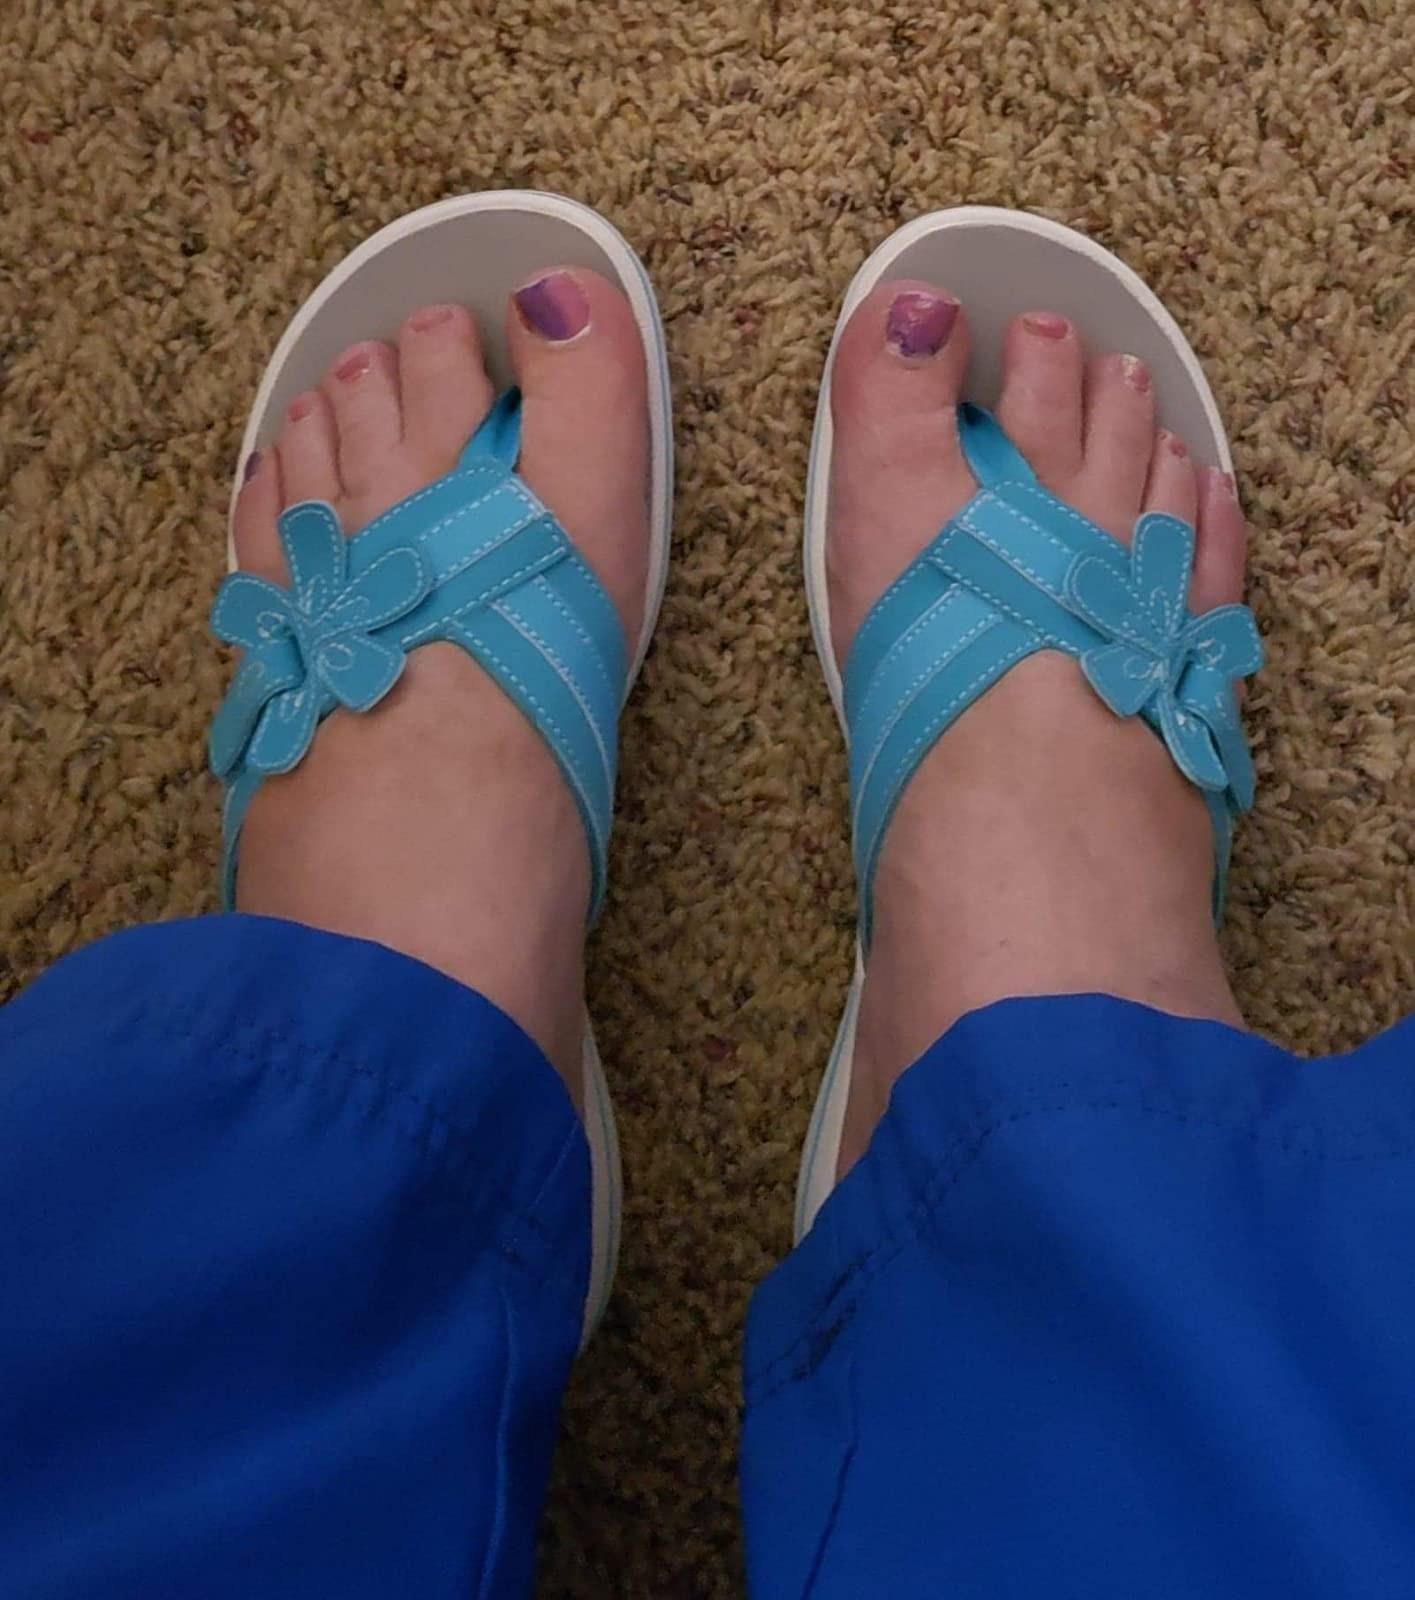 Reviewer wearing blue Clarks flip-flops with flower detail